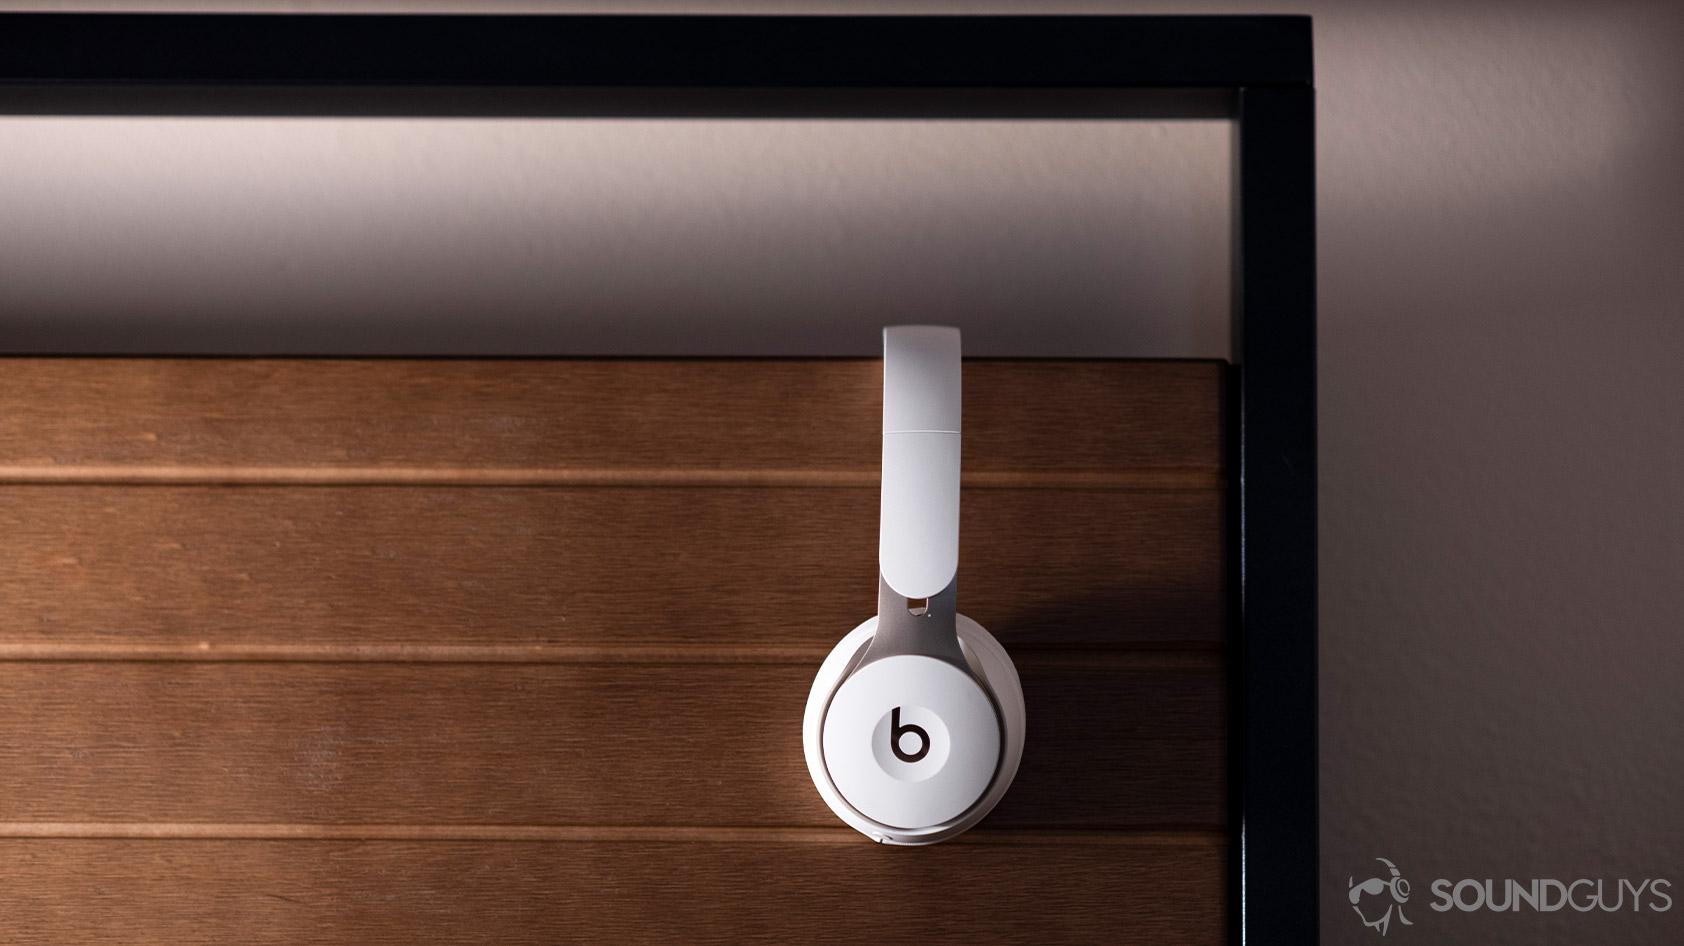 Beats Solo Pro noise cancelling headphones profile wood background